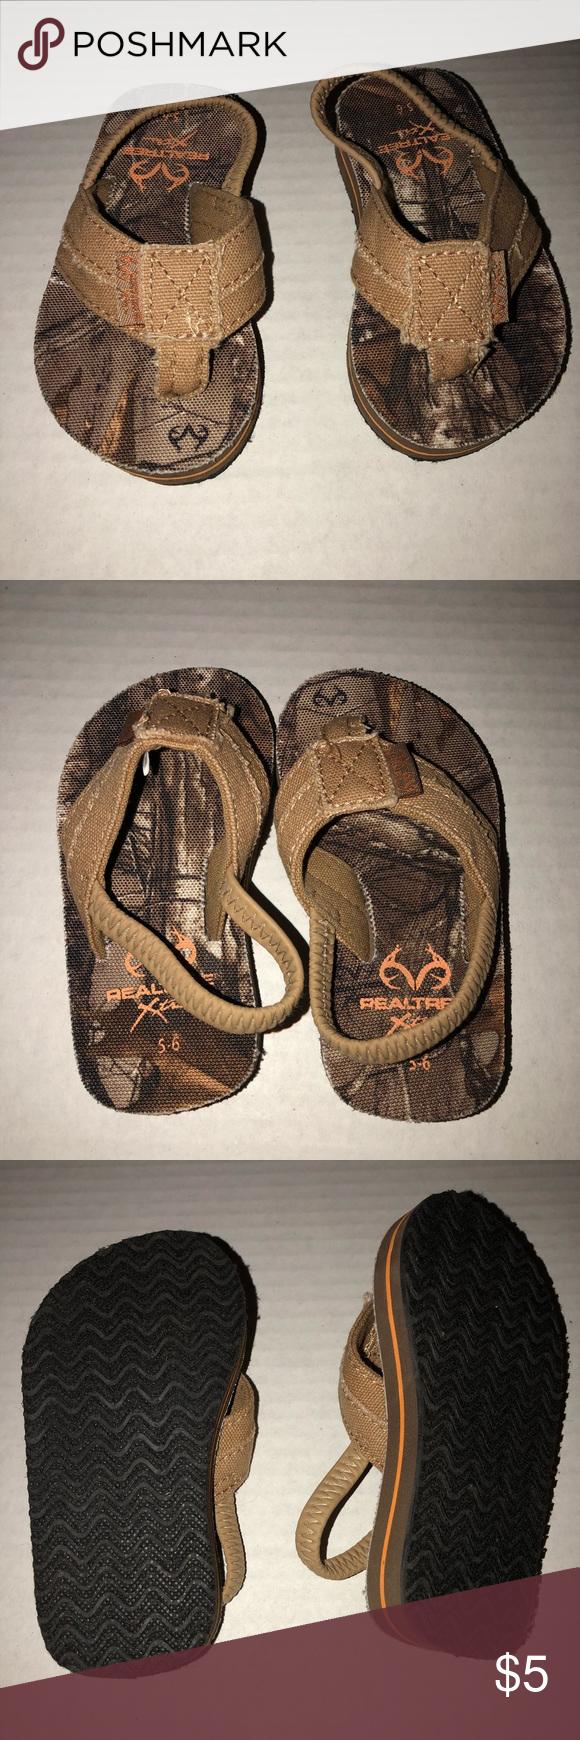 e8967158ef5b8 Real Tree Brown Camo Foam Thong Sandals 5-6